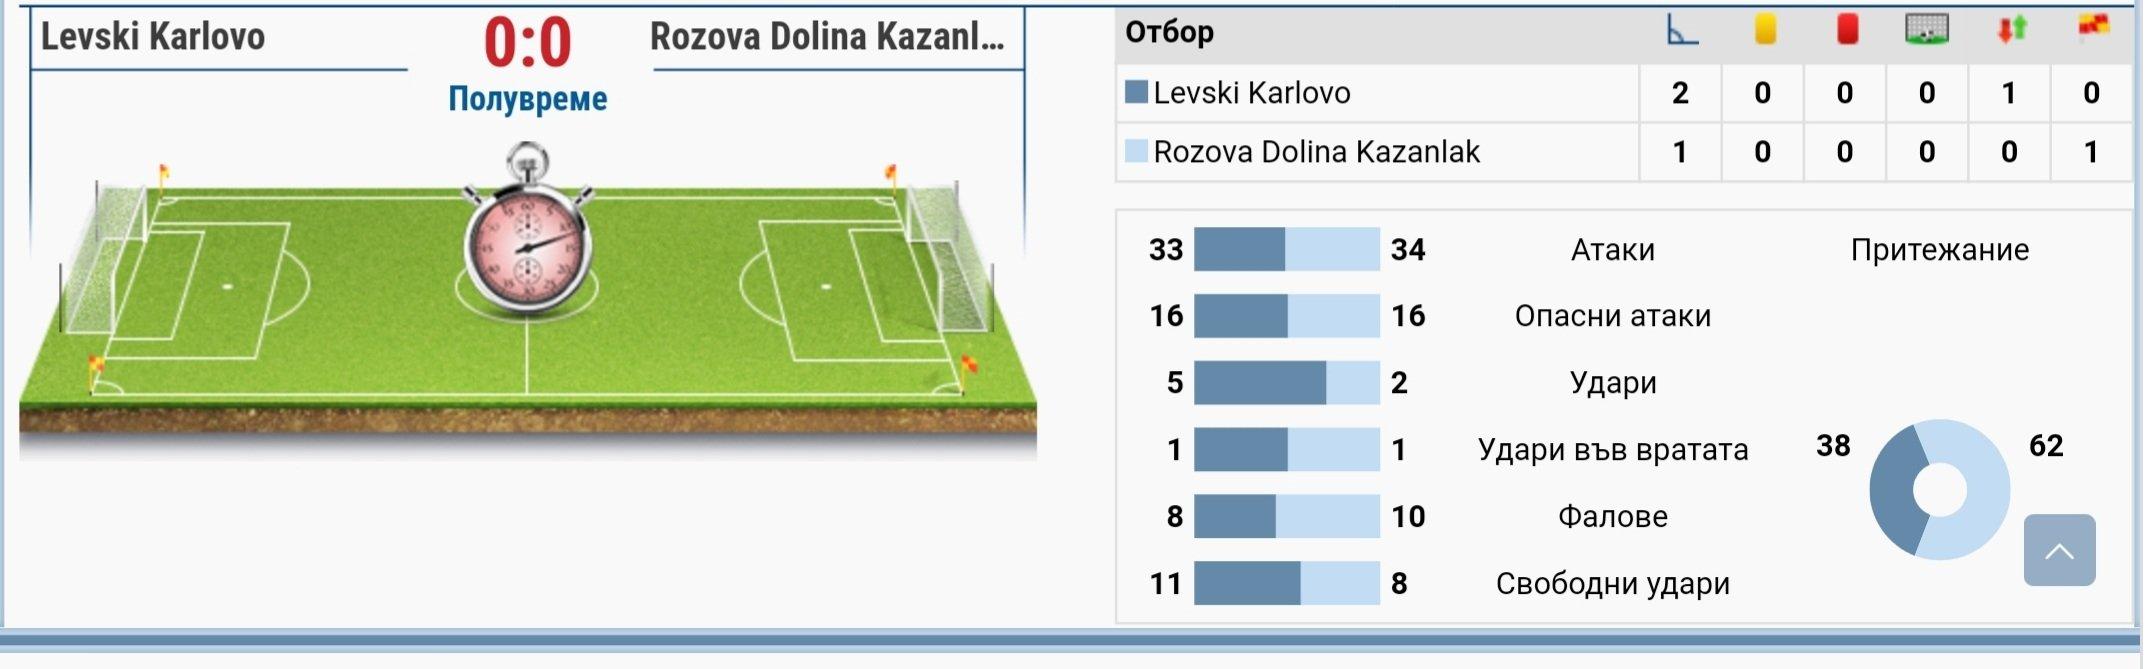 28 кръг: ФК Левски (Карлово) - ФК Розова долина (Казанлък)